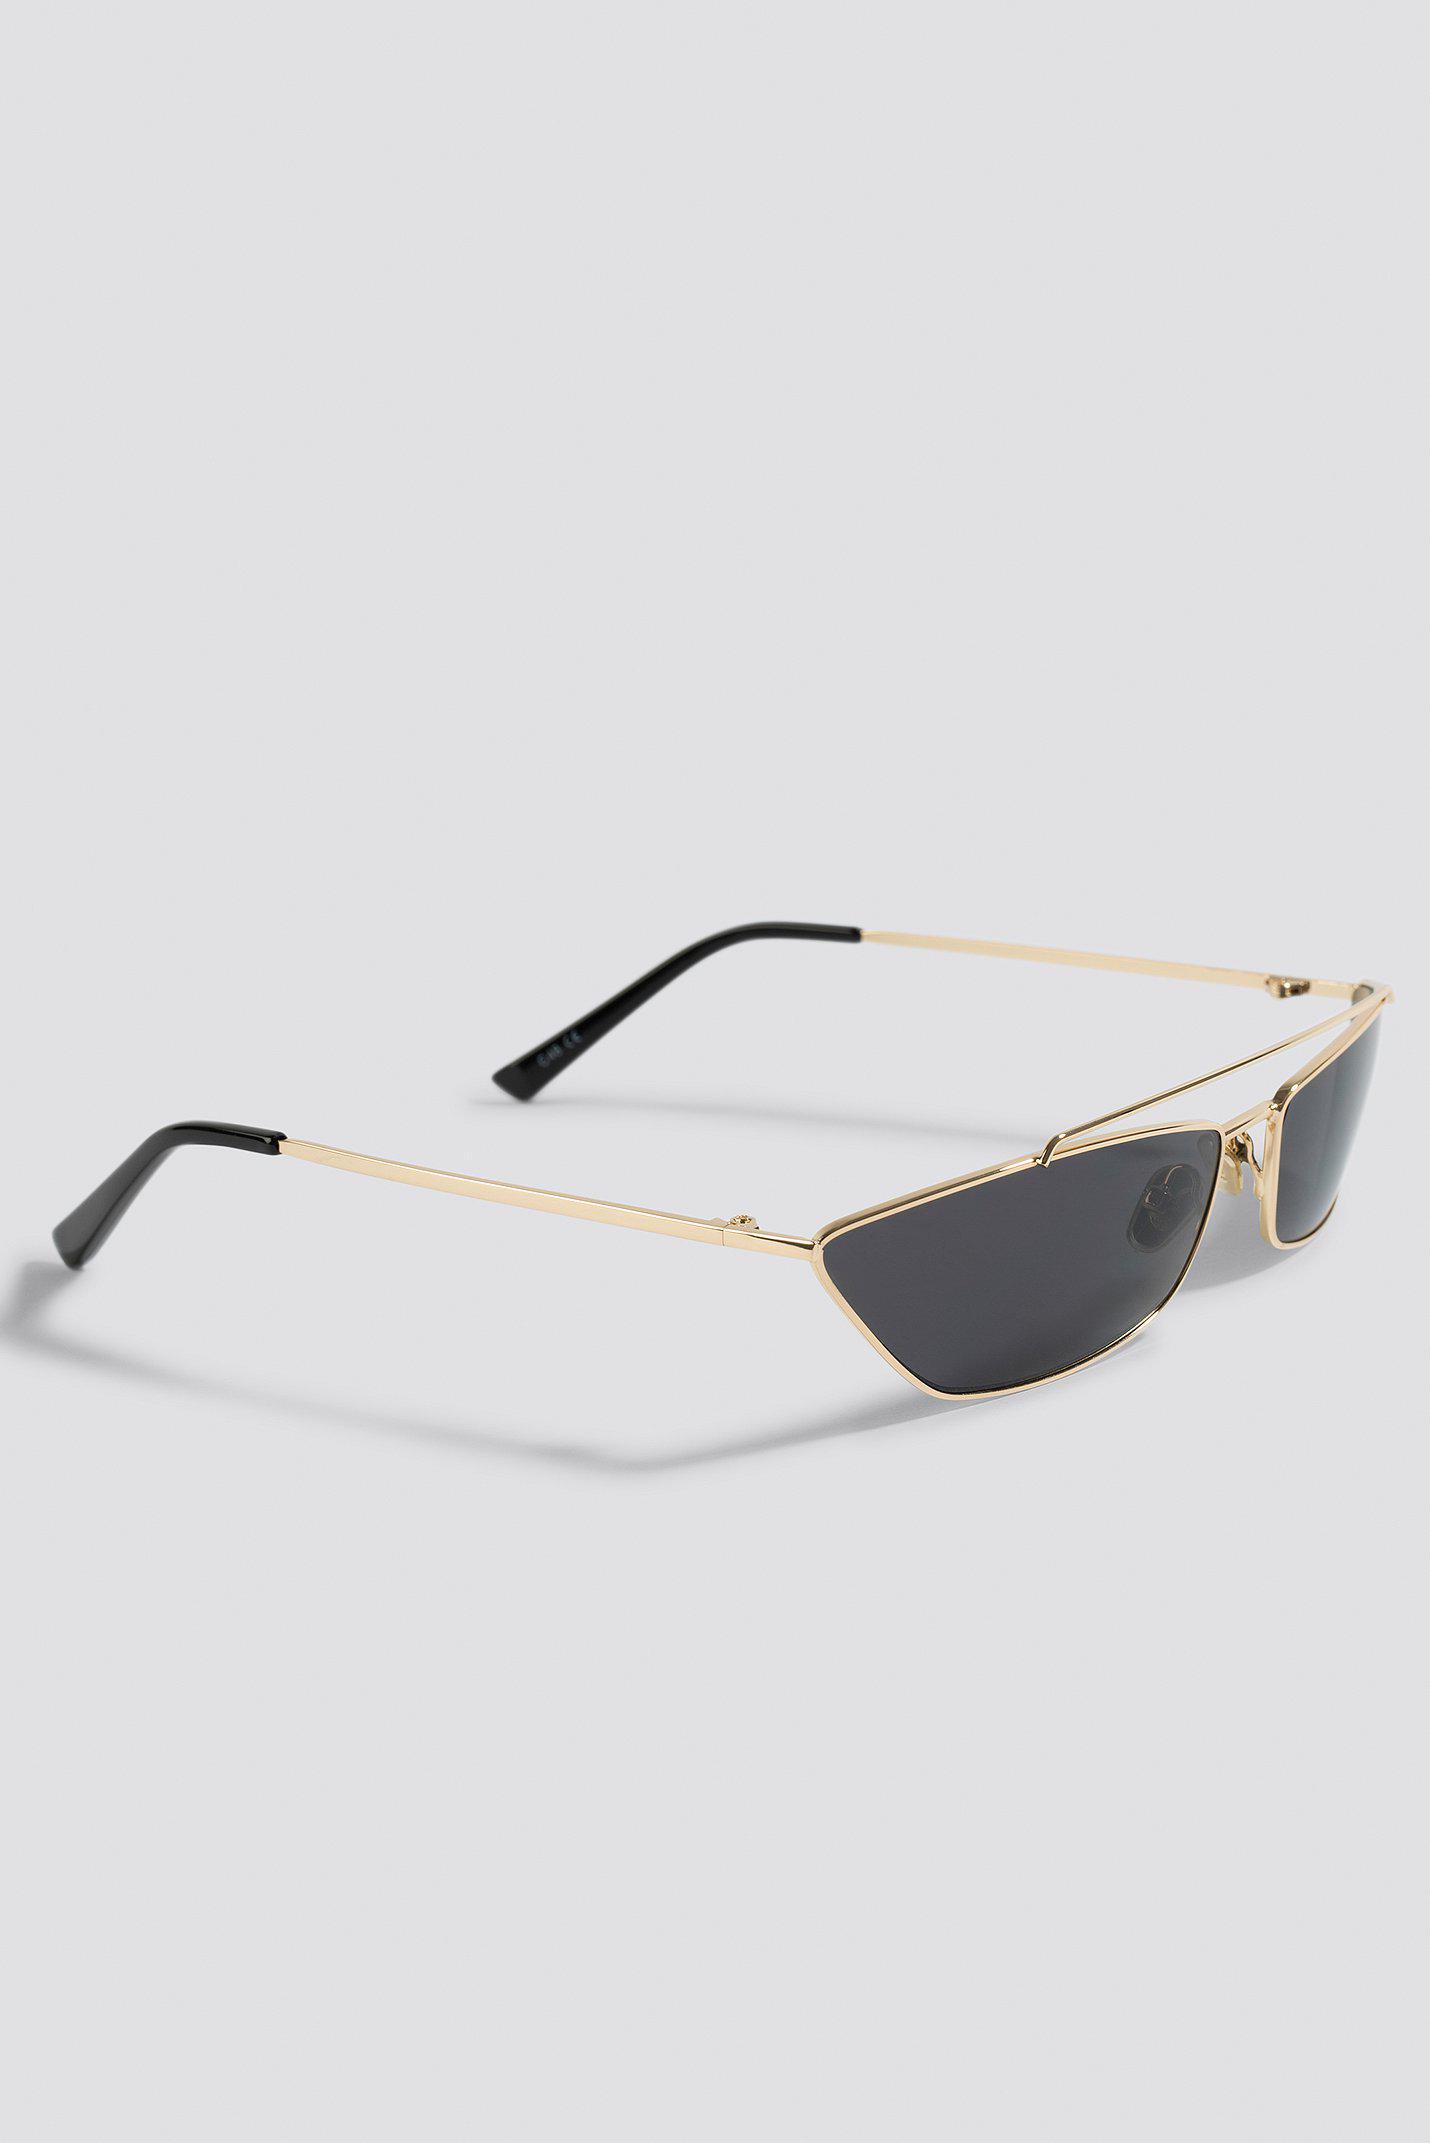 48387192492 Na trapezoid metal bridge sunglasses black in black lyst jpg 1430x2143 Trapezoid  sunglasses